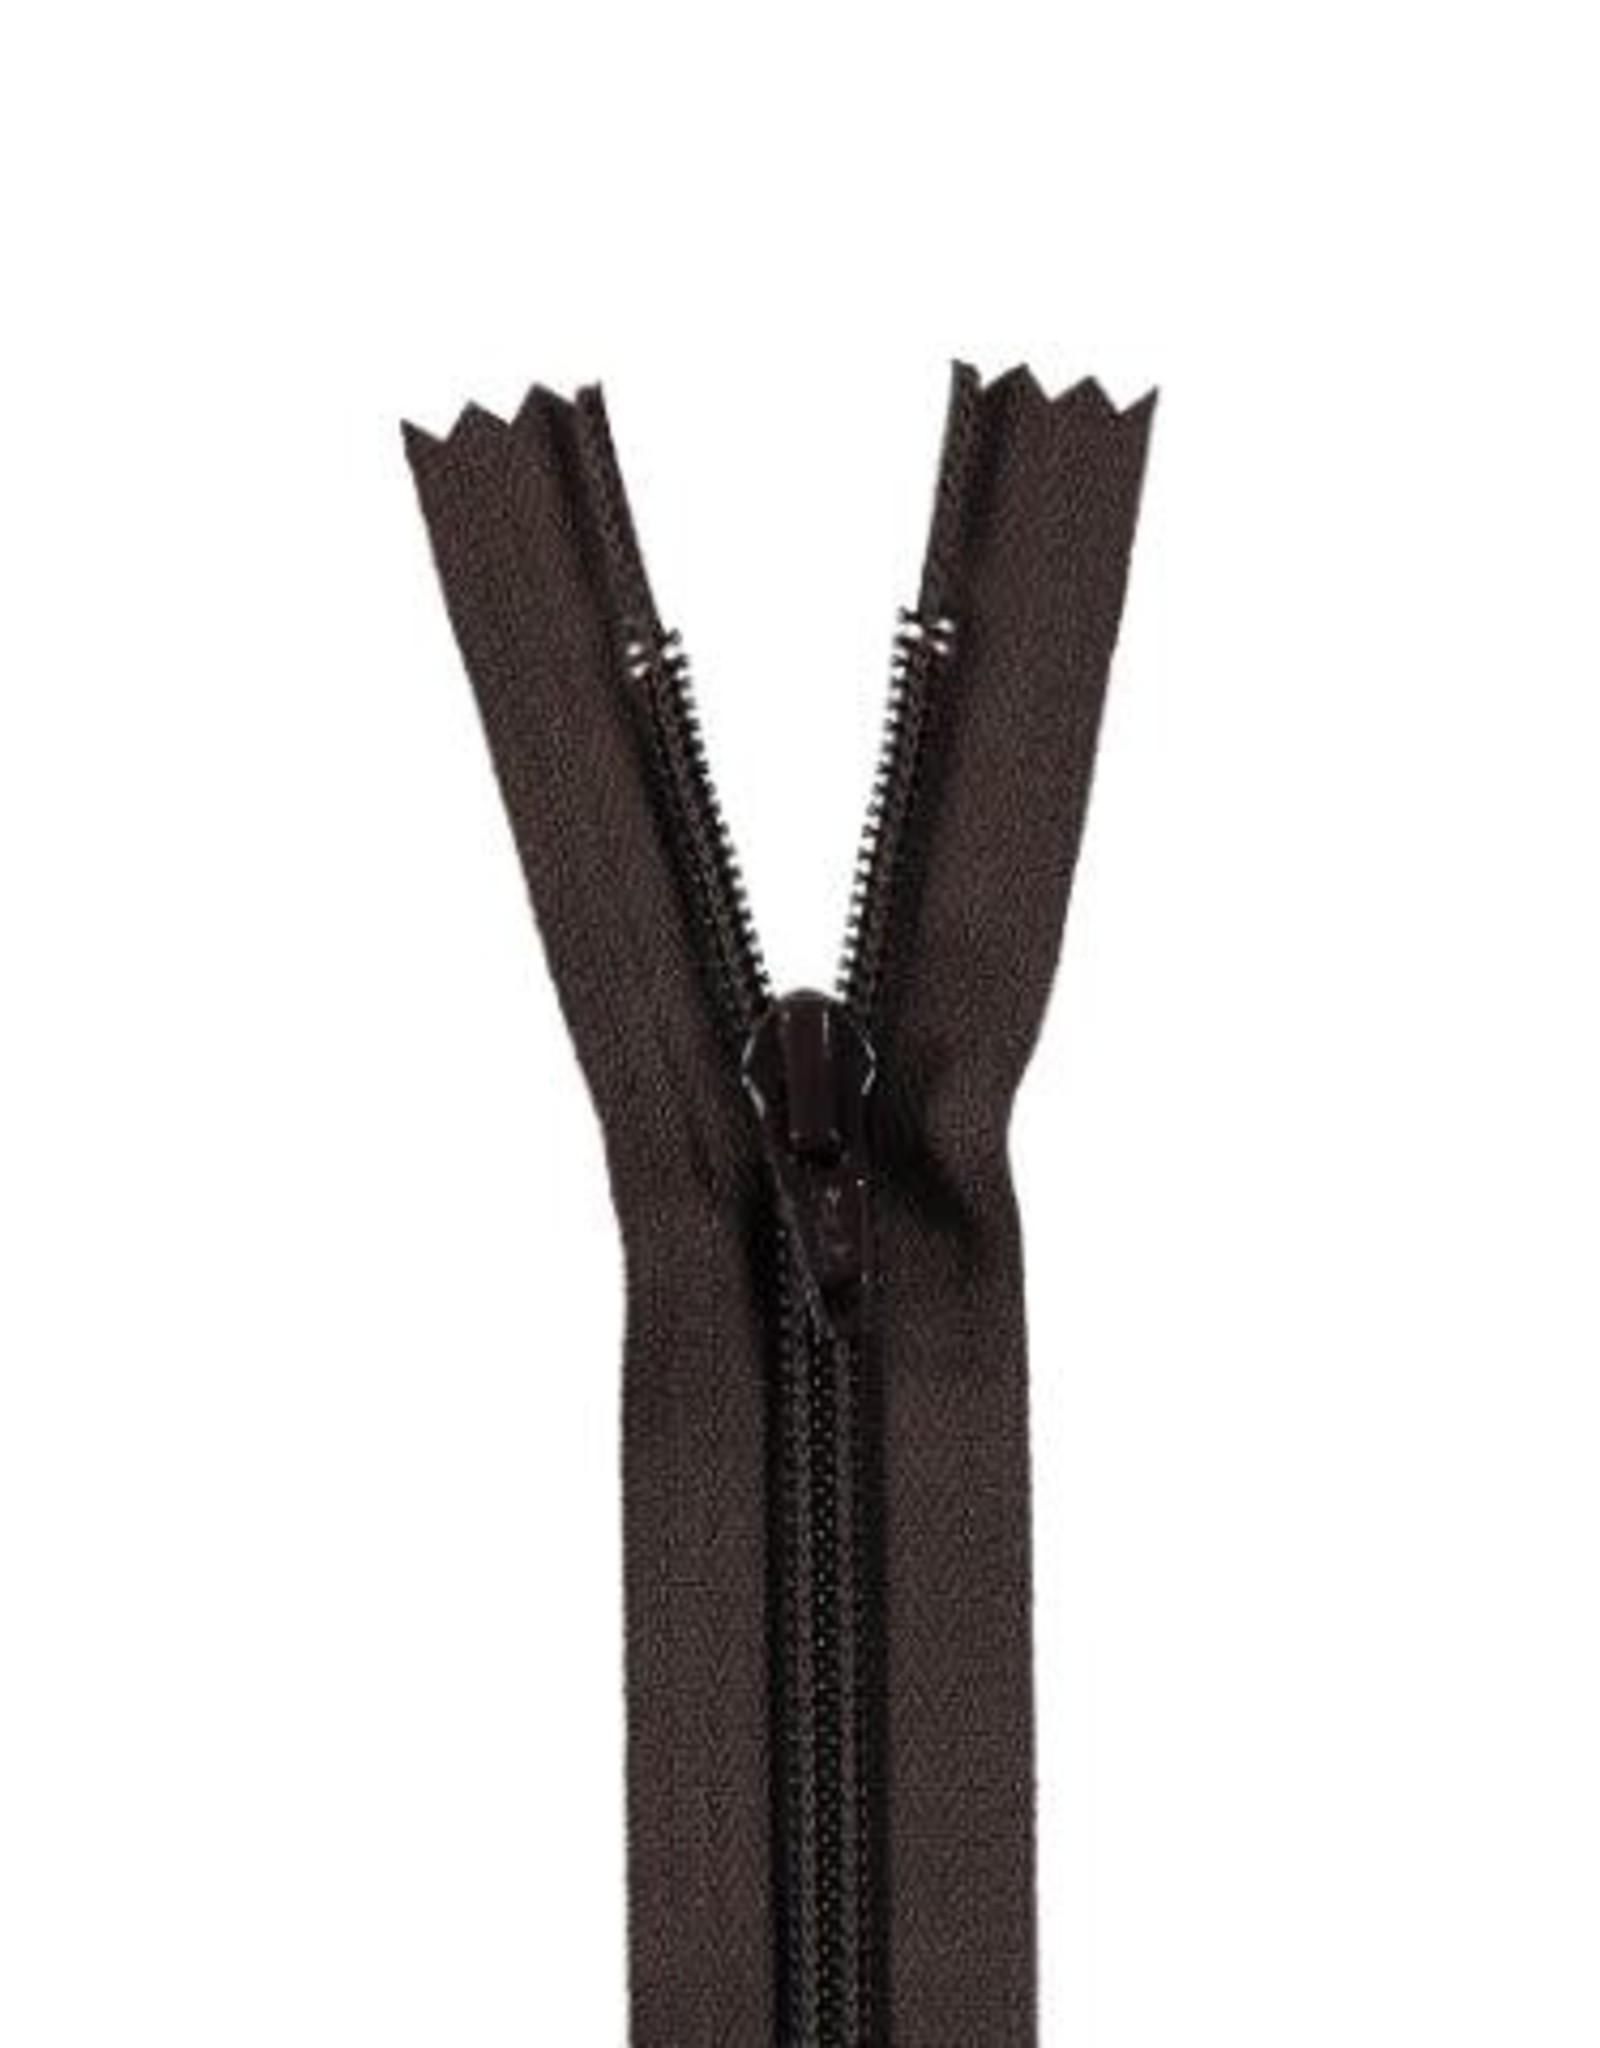 YKK Spiraalrits niet-DB 3mm donker bruin 570-45cm